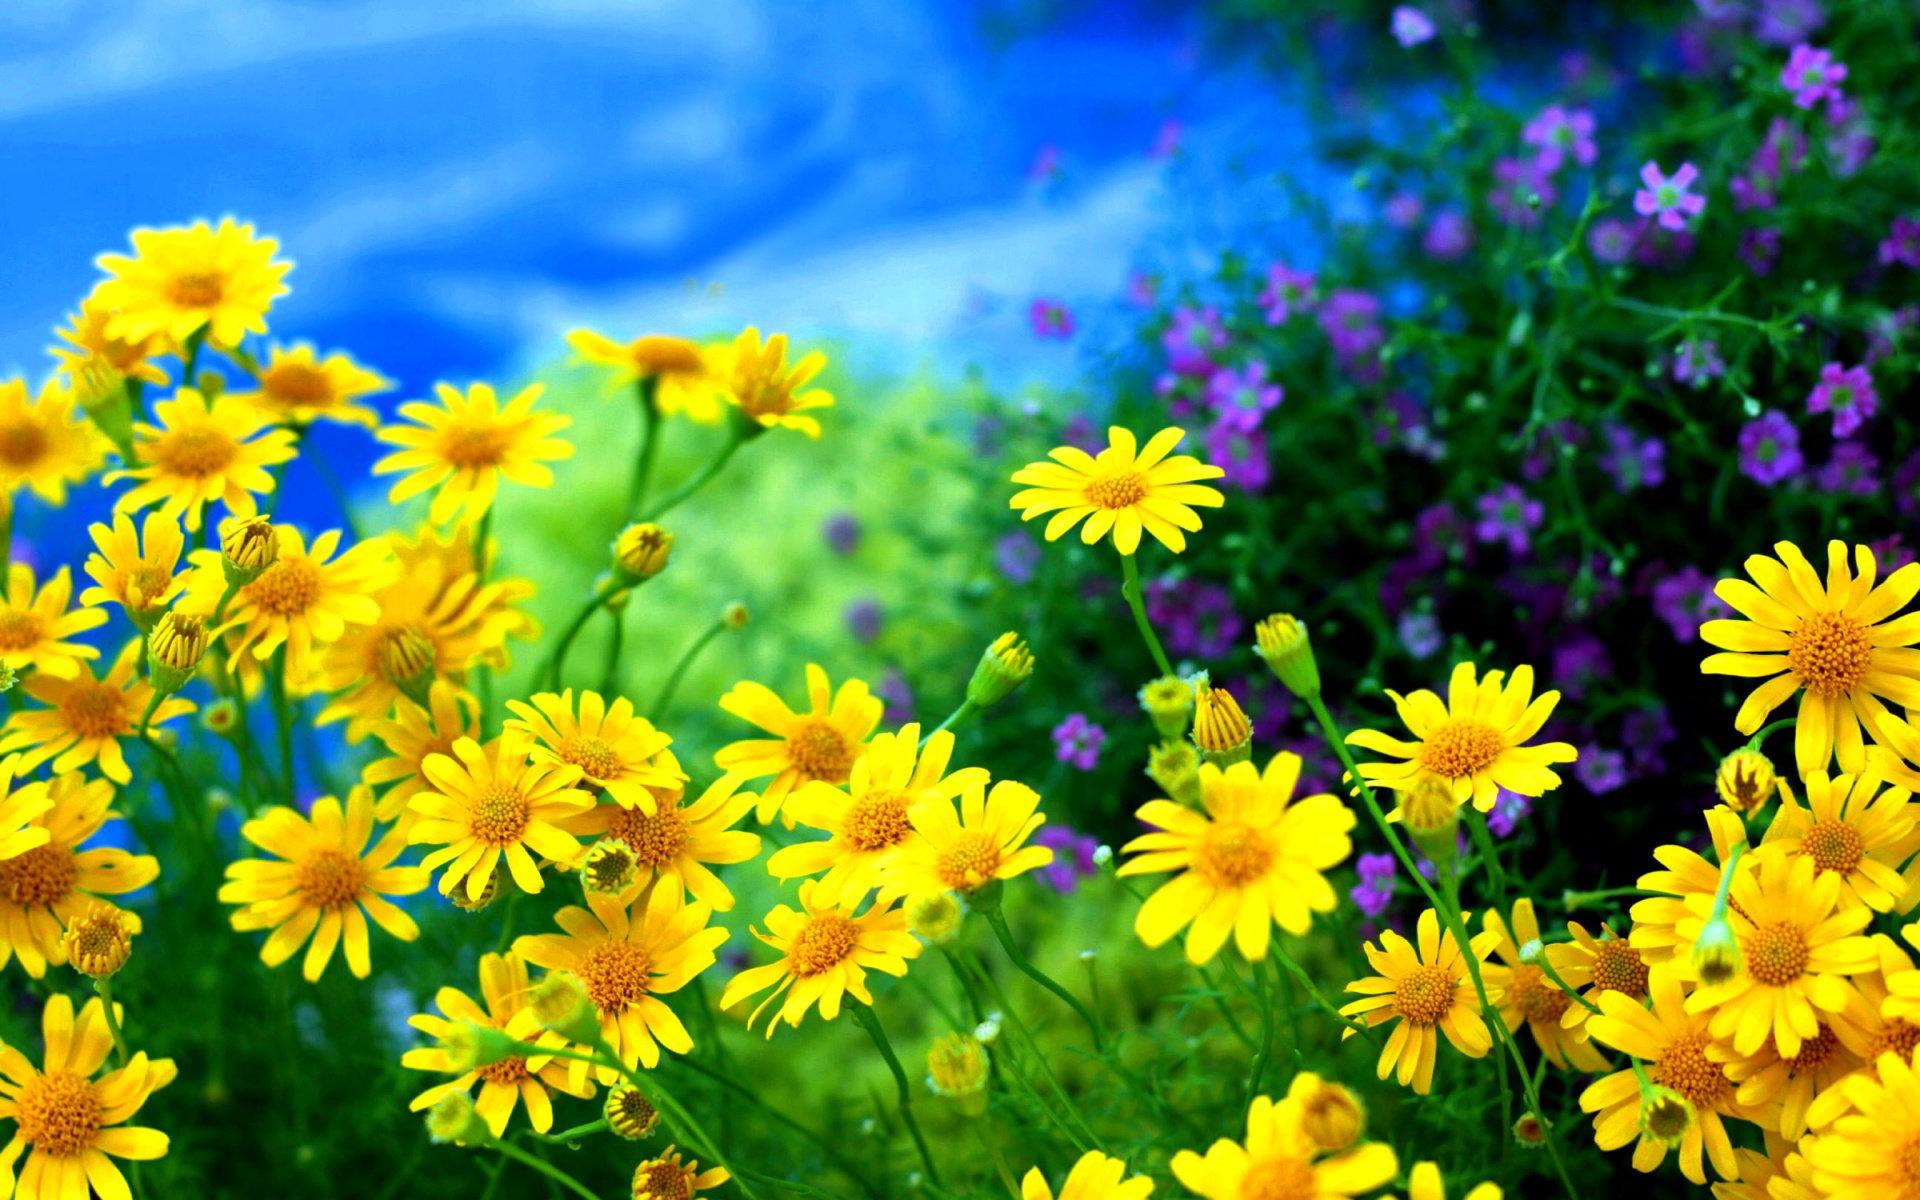 hinh anh hoa cuc dep 42